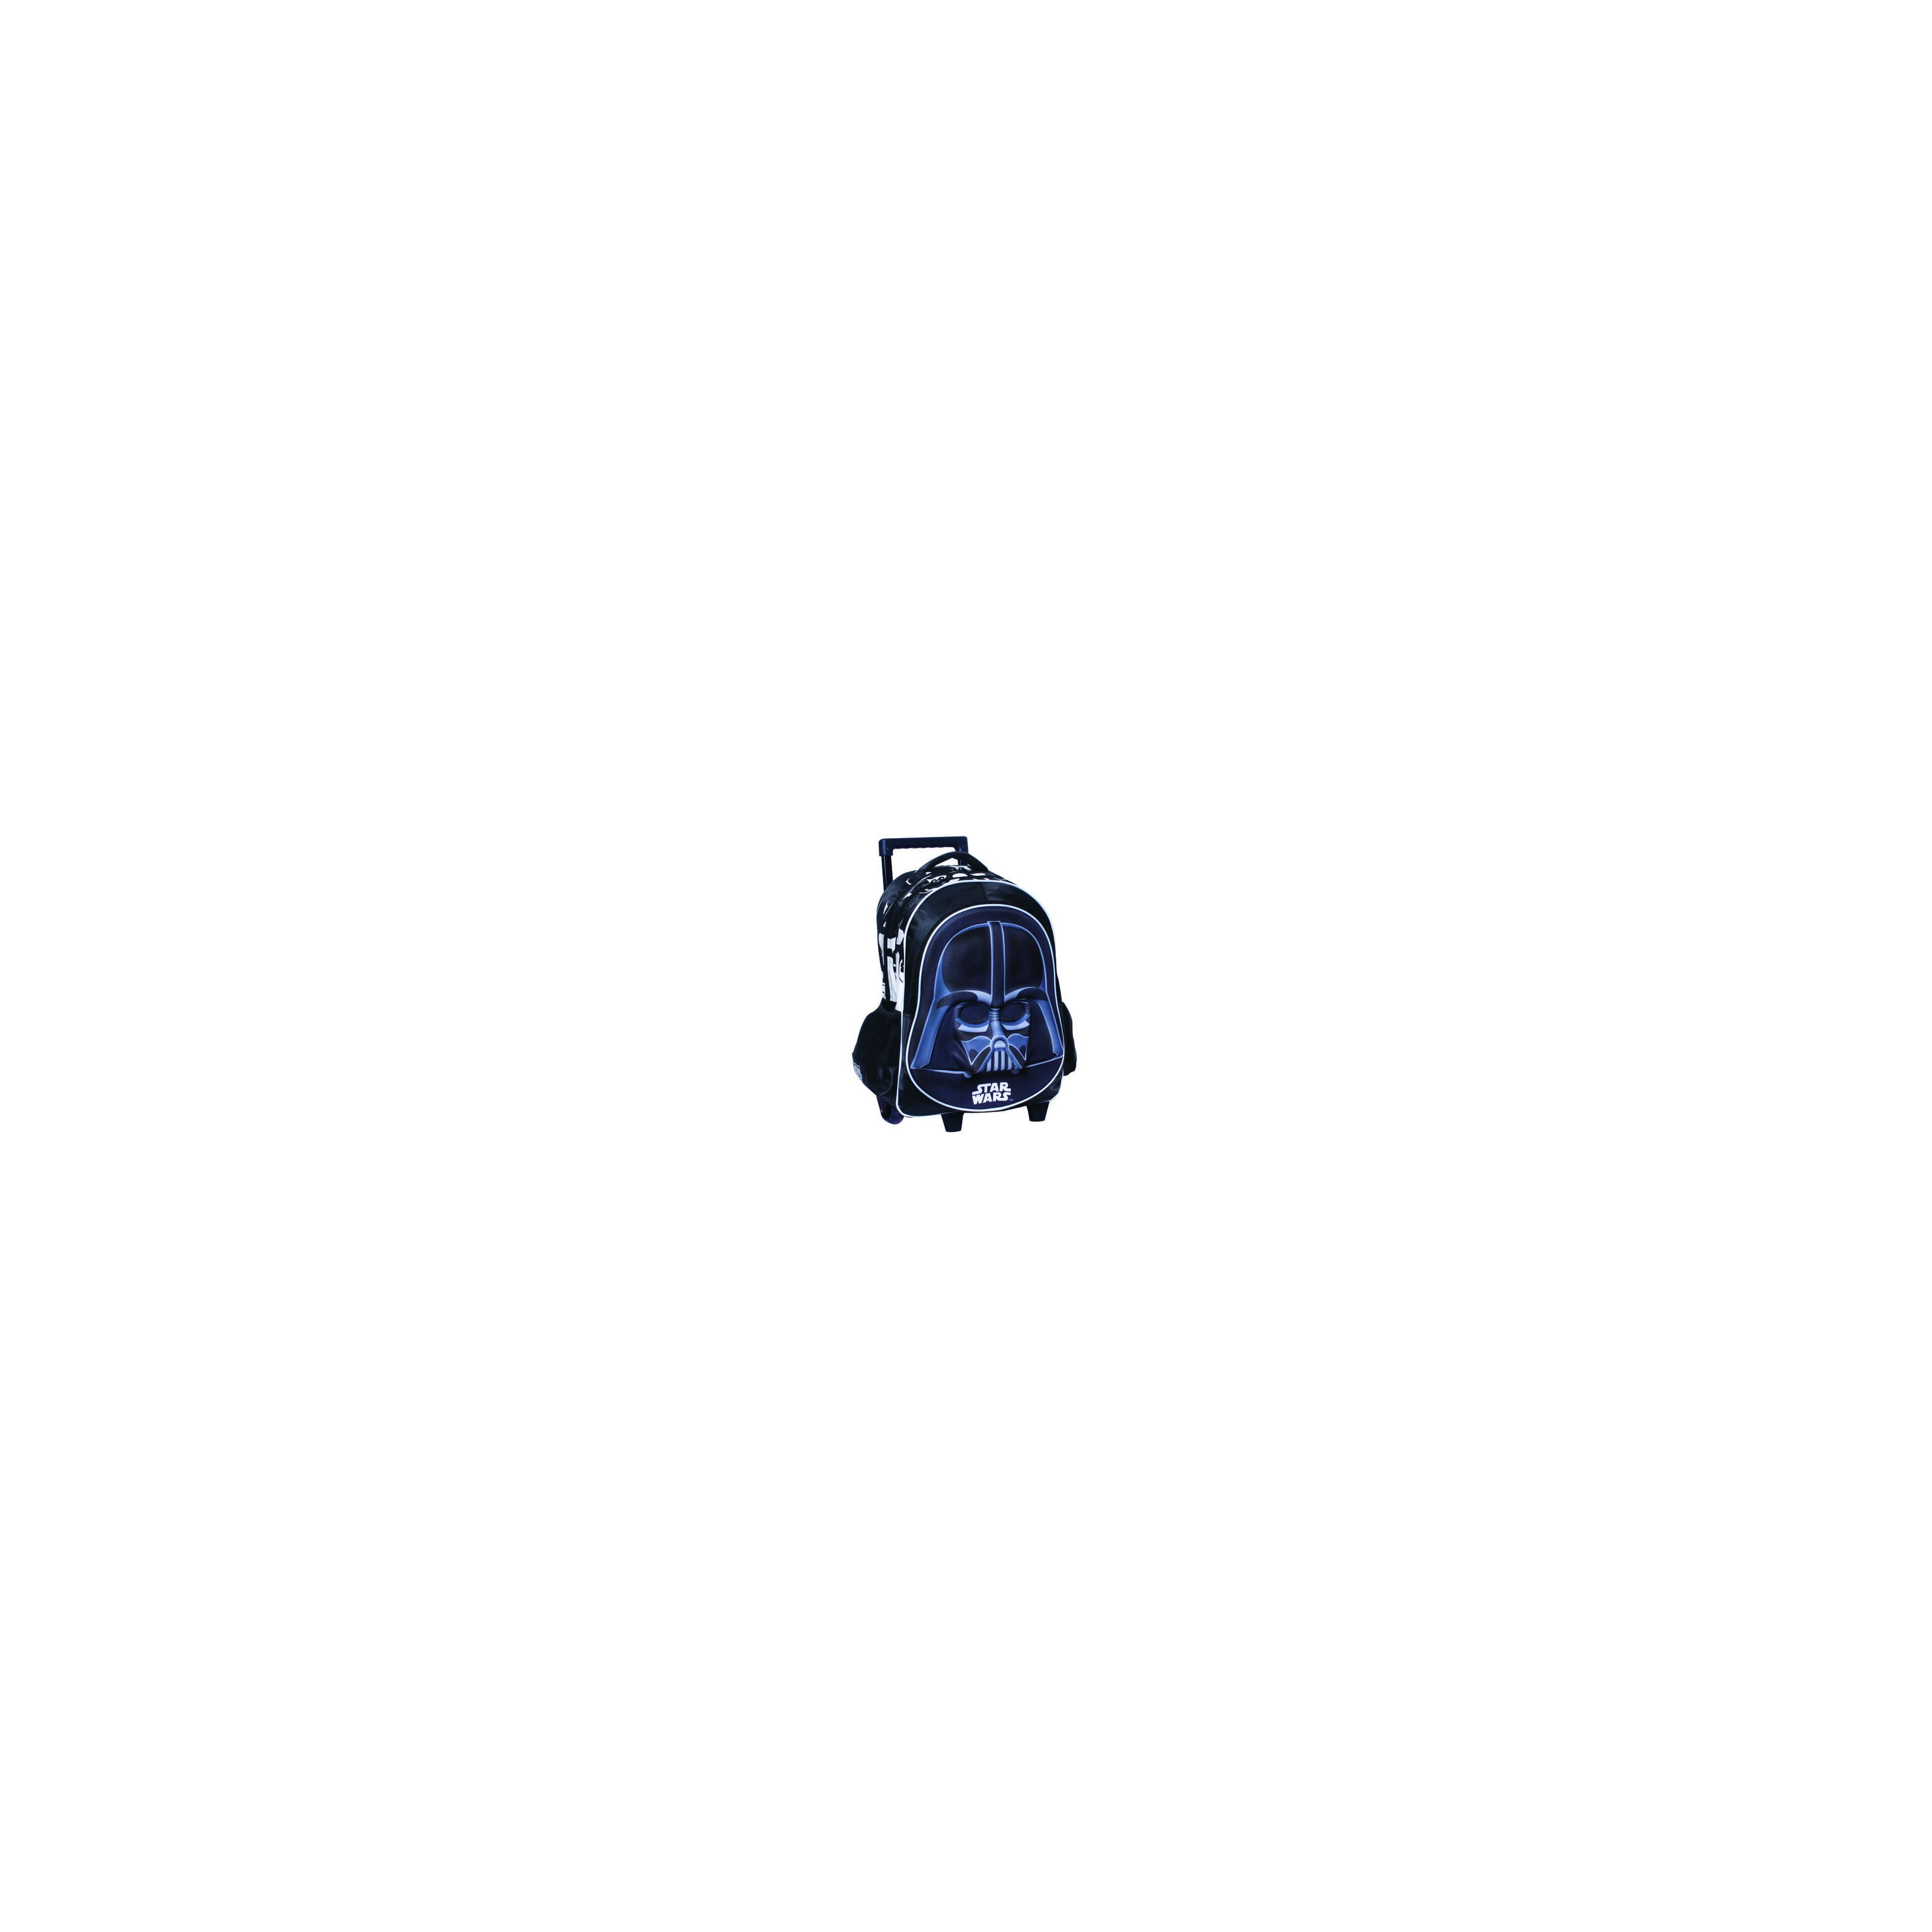 58c5d6ba212 Σχολική Τσάντα Trolley Star Wars Vader 338-17074 | Σχολικά Τρόλευ ...